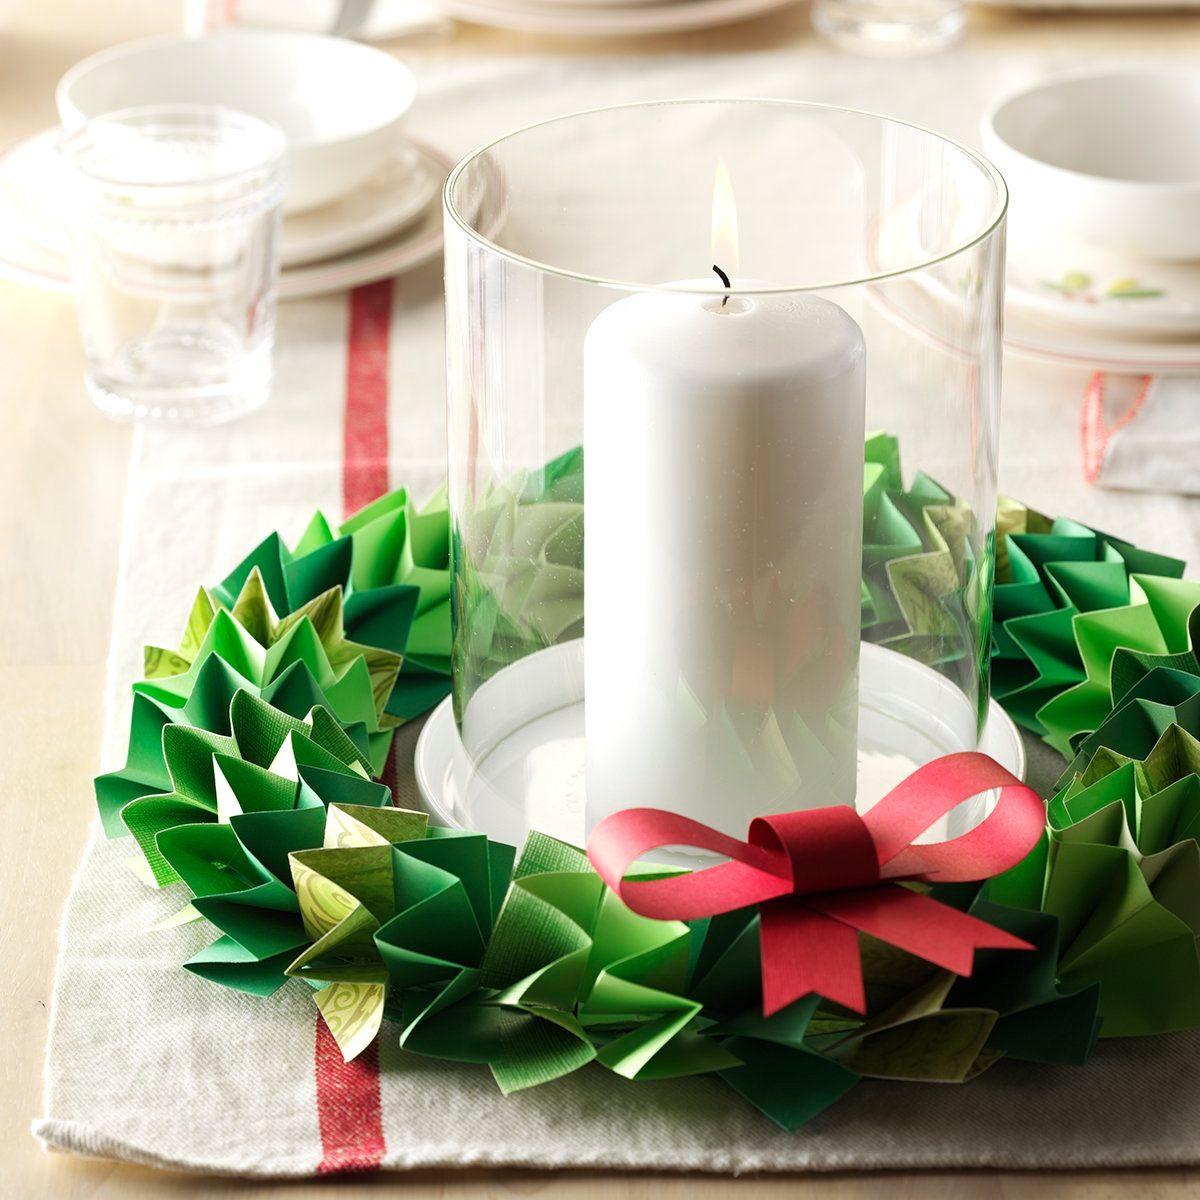 Paper wreath craft